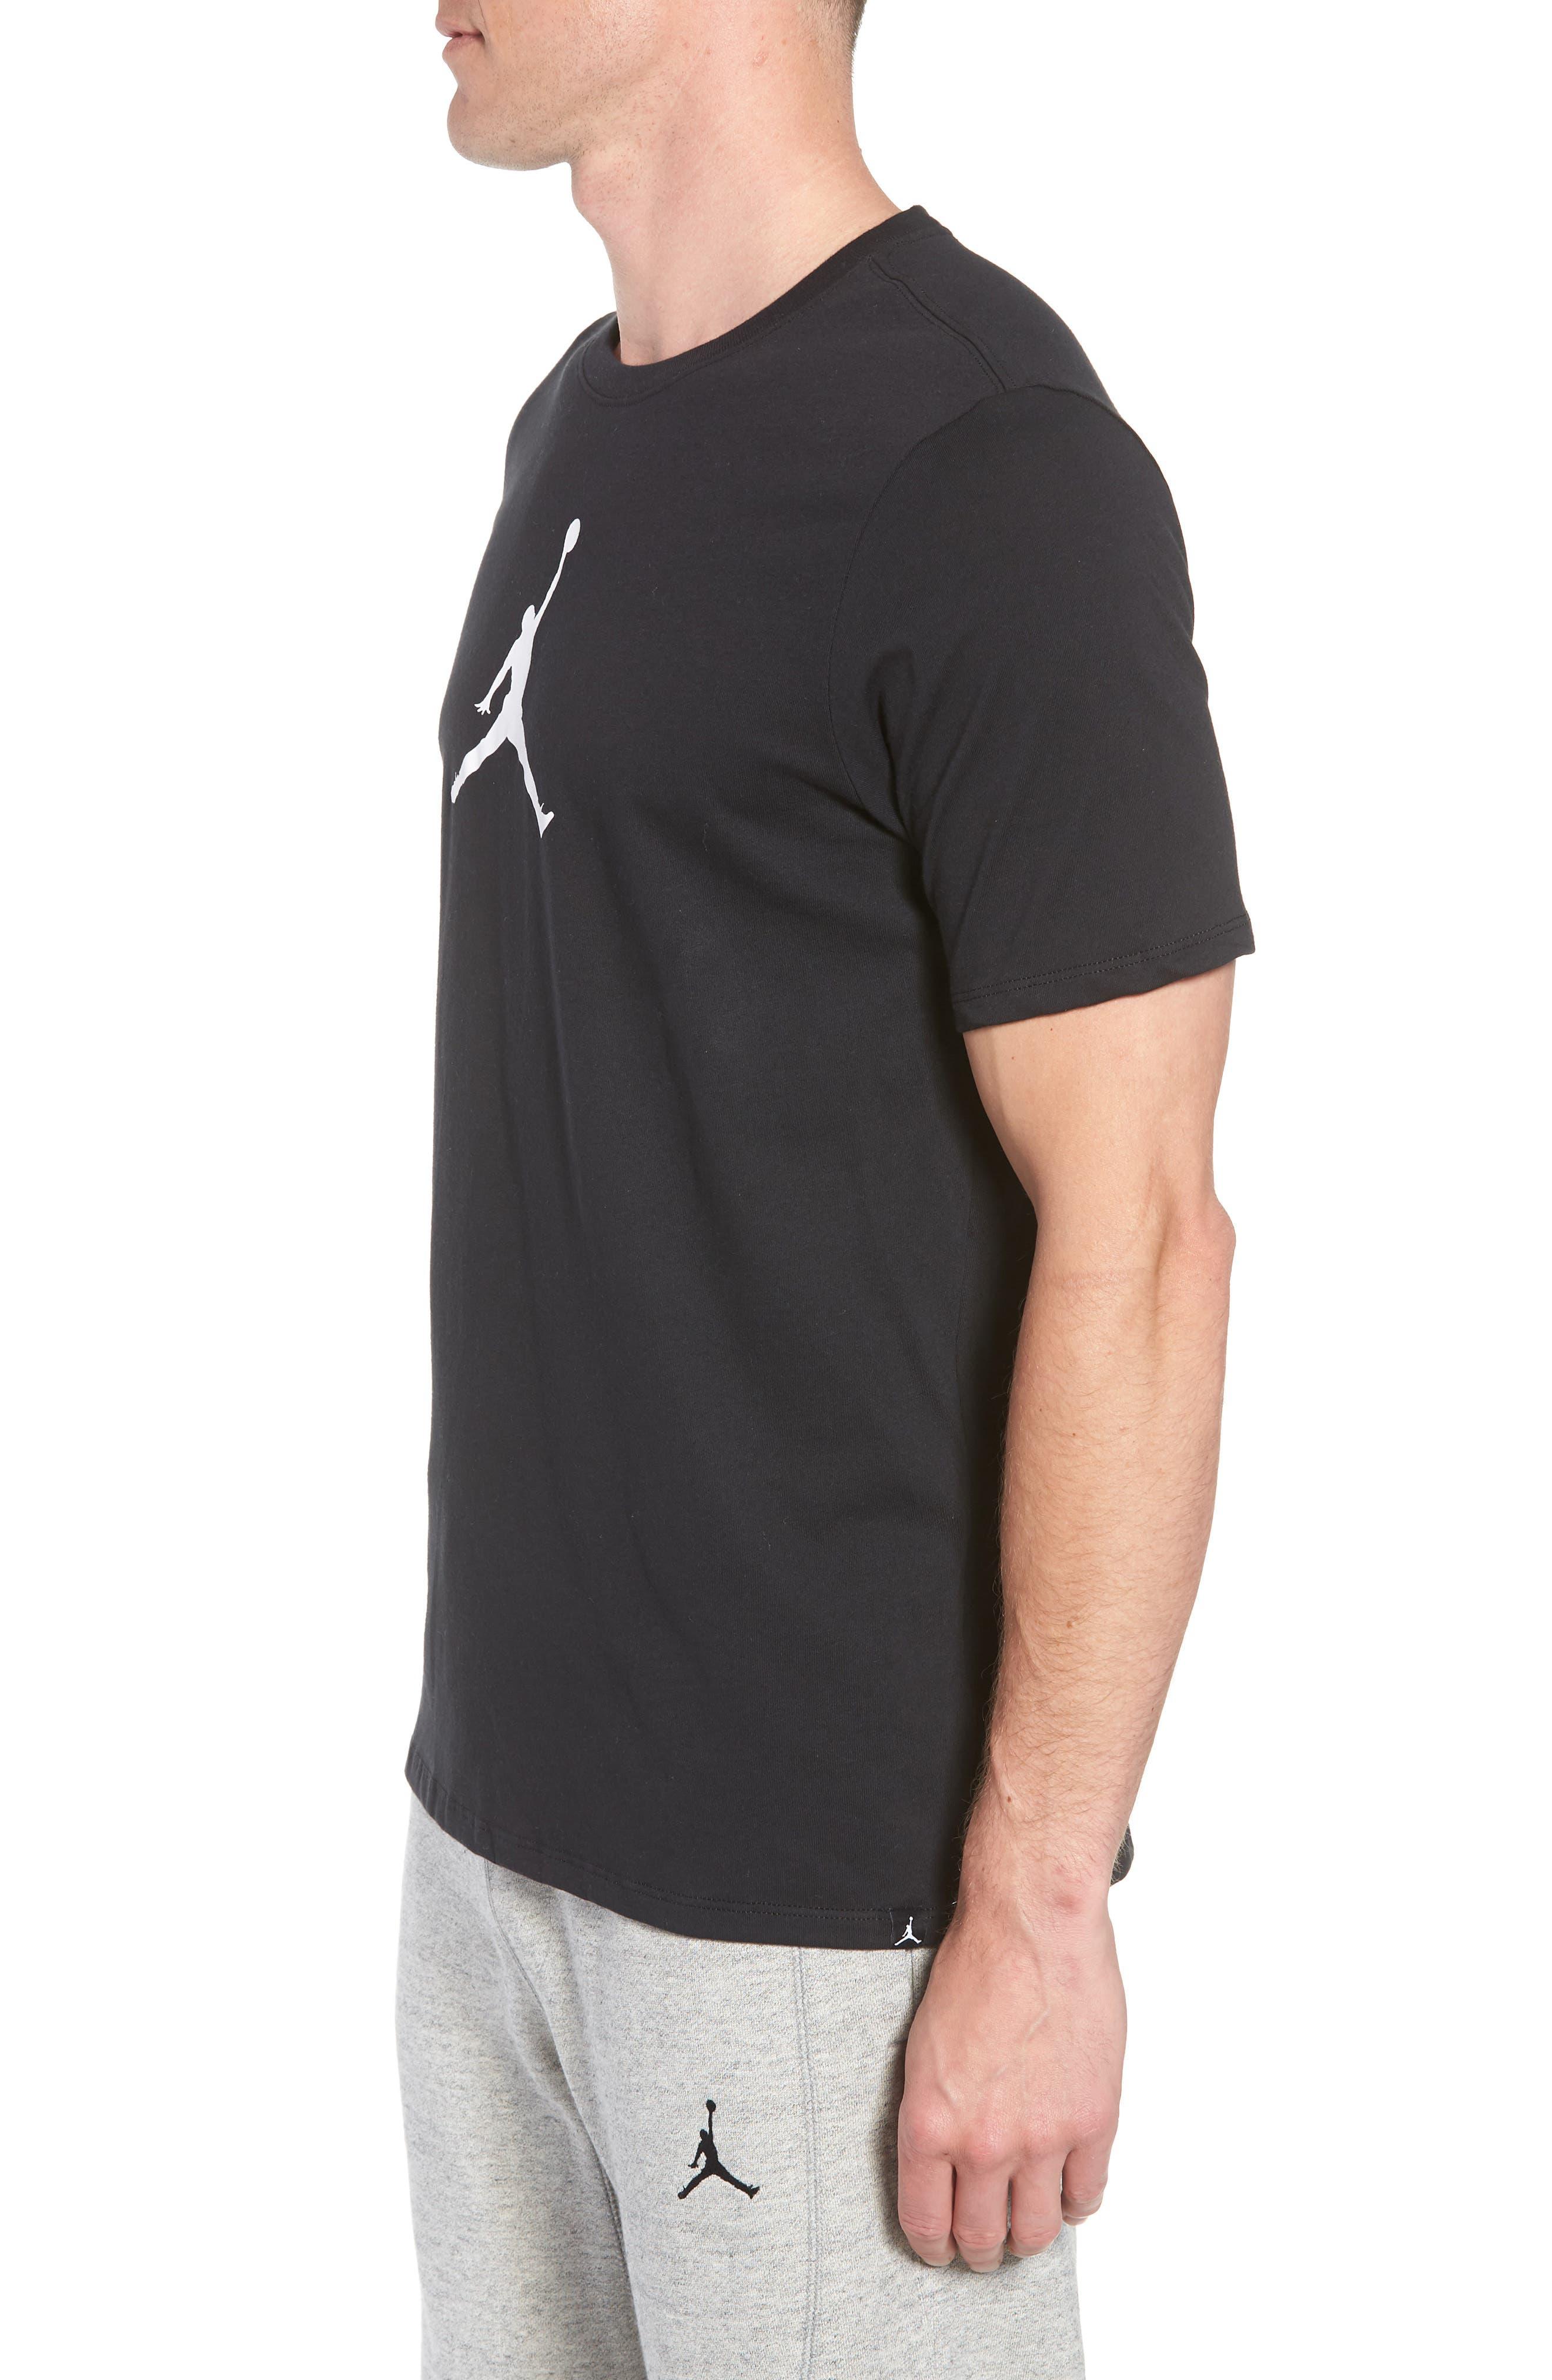 Iconic Jumpman Graphic T-Shirt,                             Alternate thumbnail 3, color,                             Black/ White